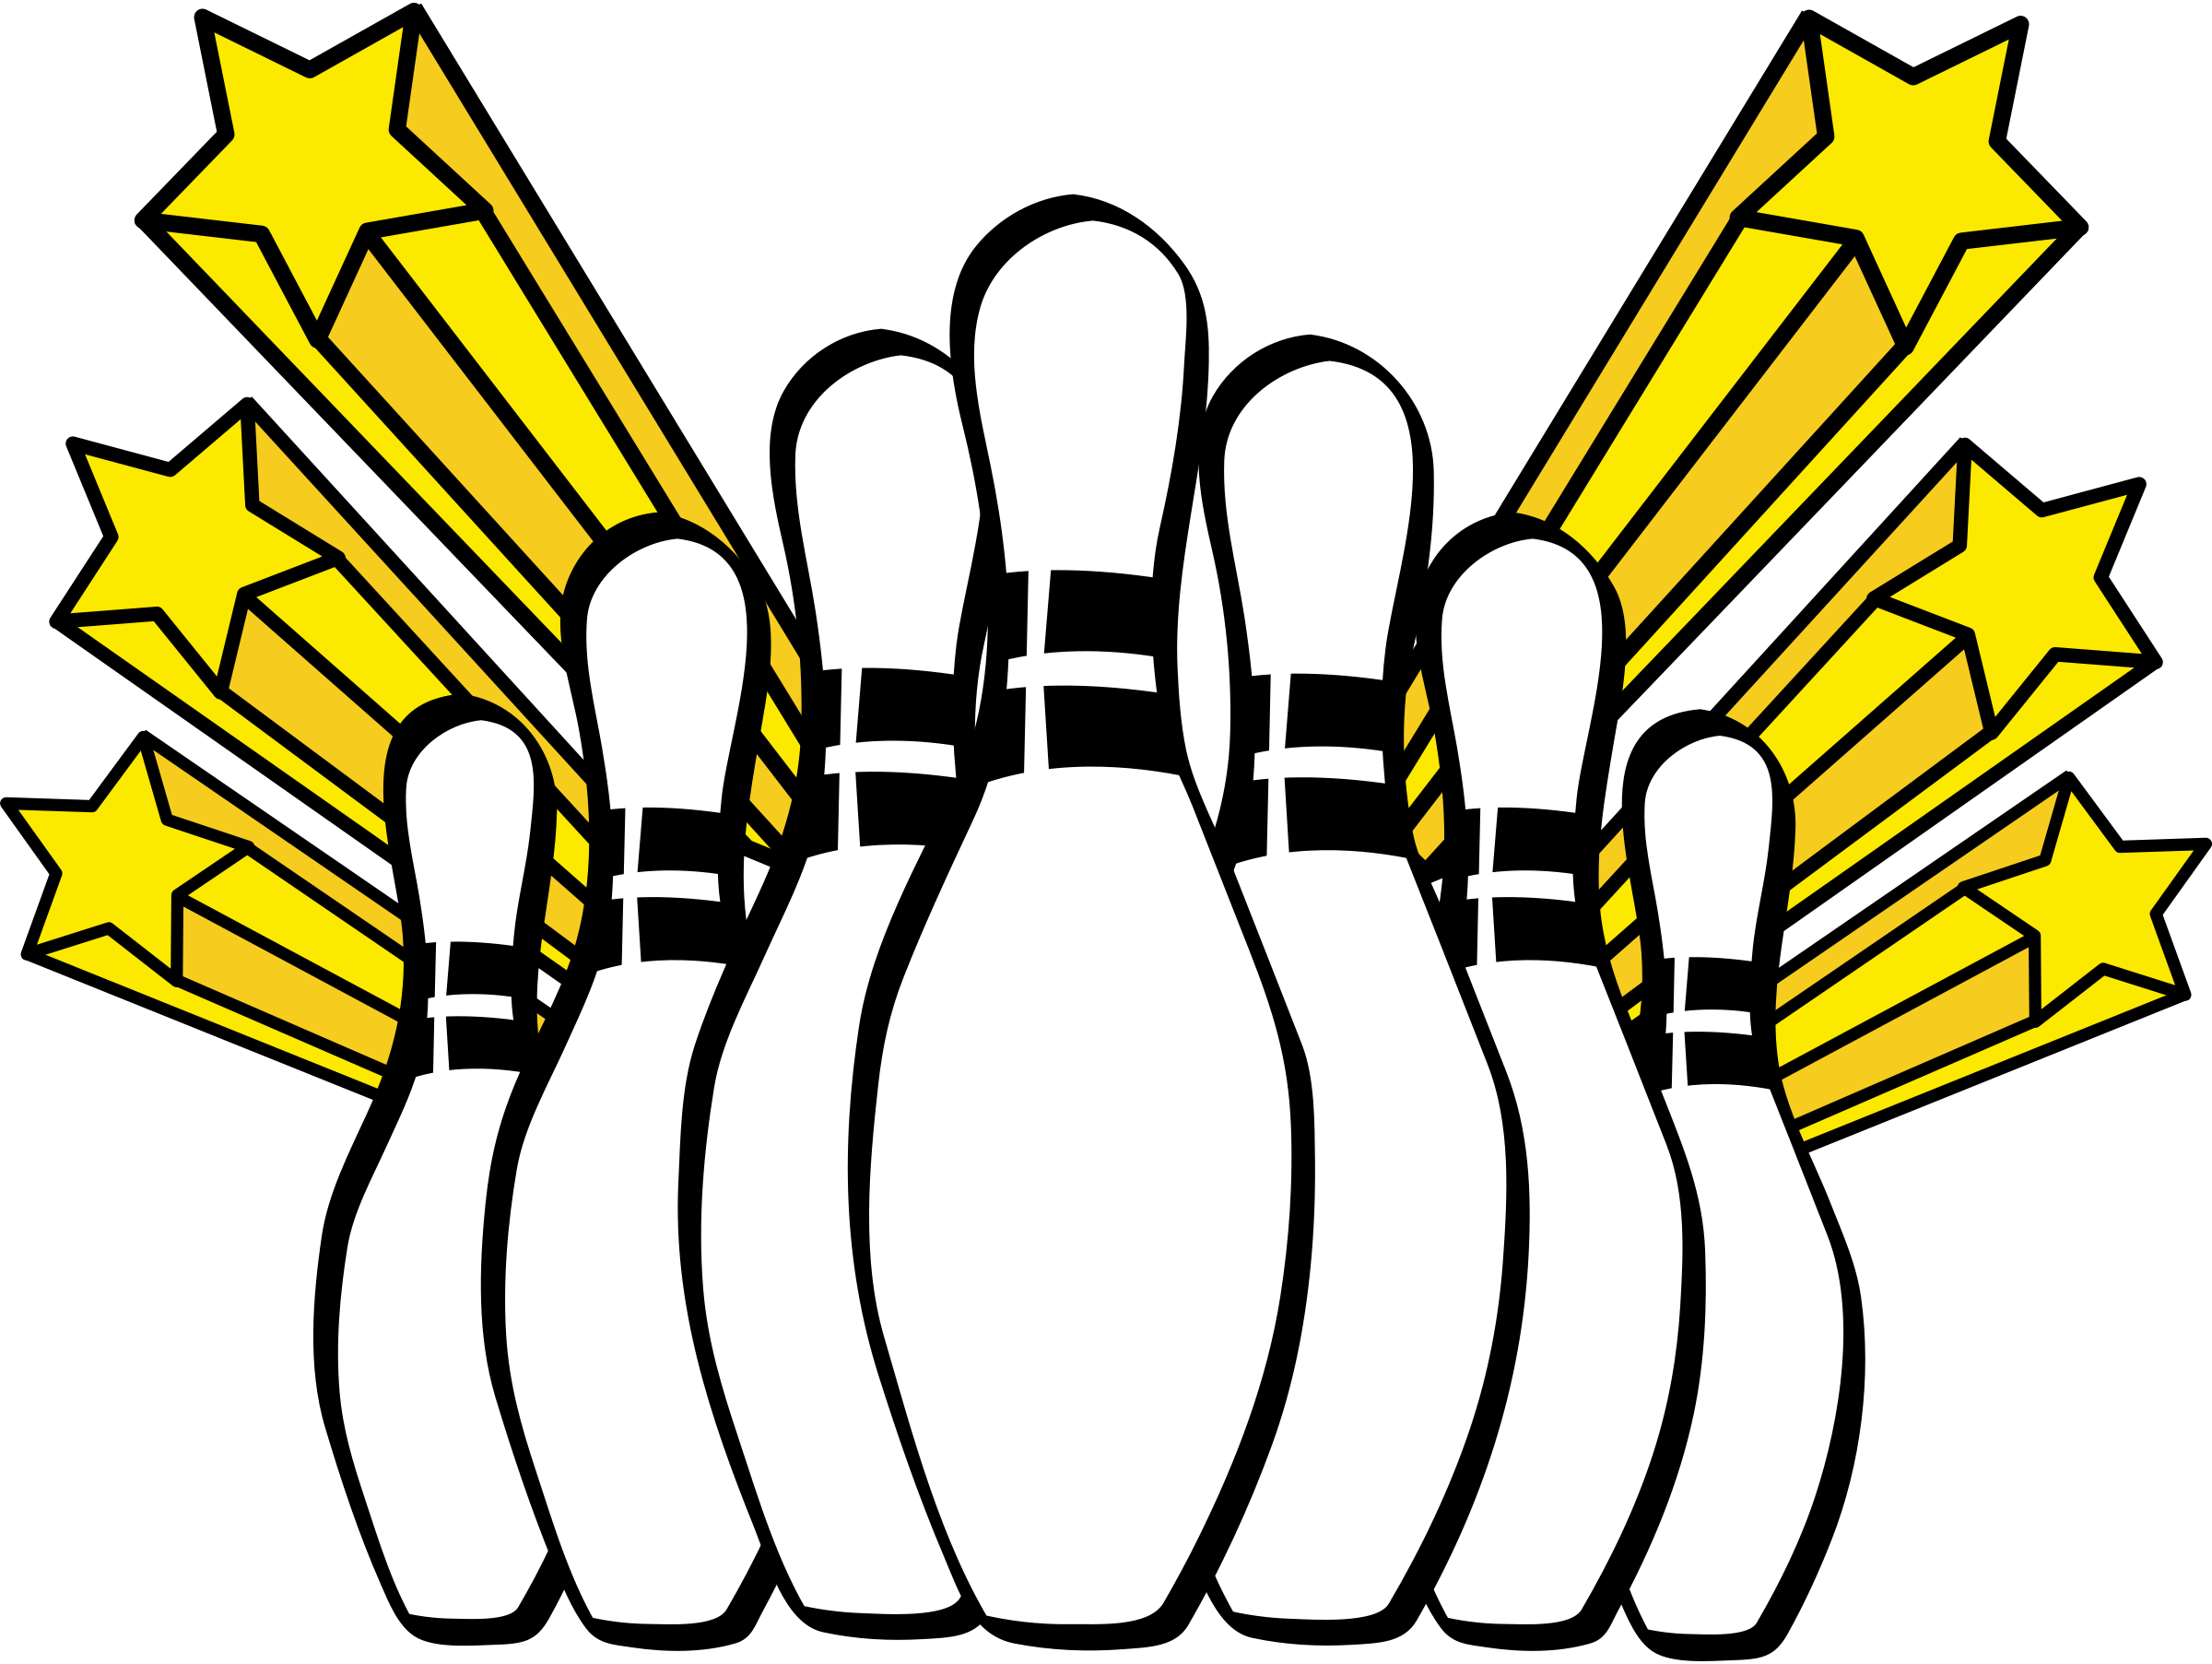 Retro clipart bowling pin #1